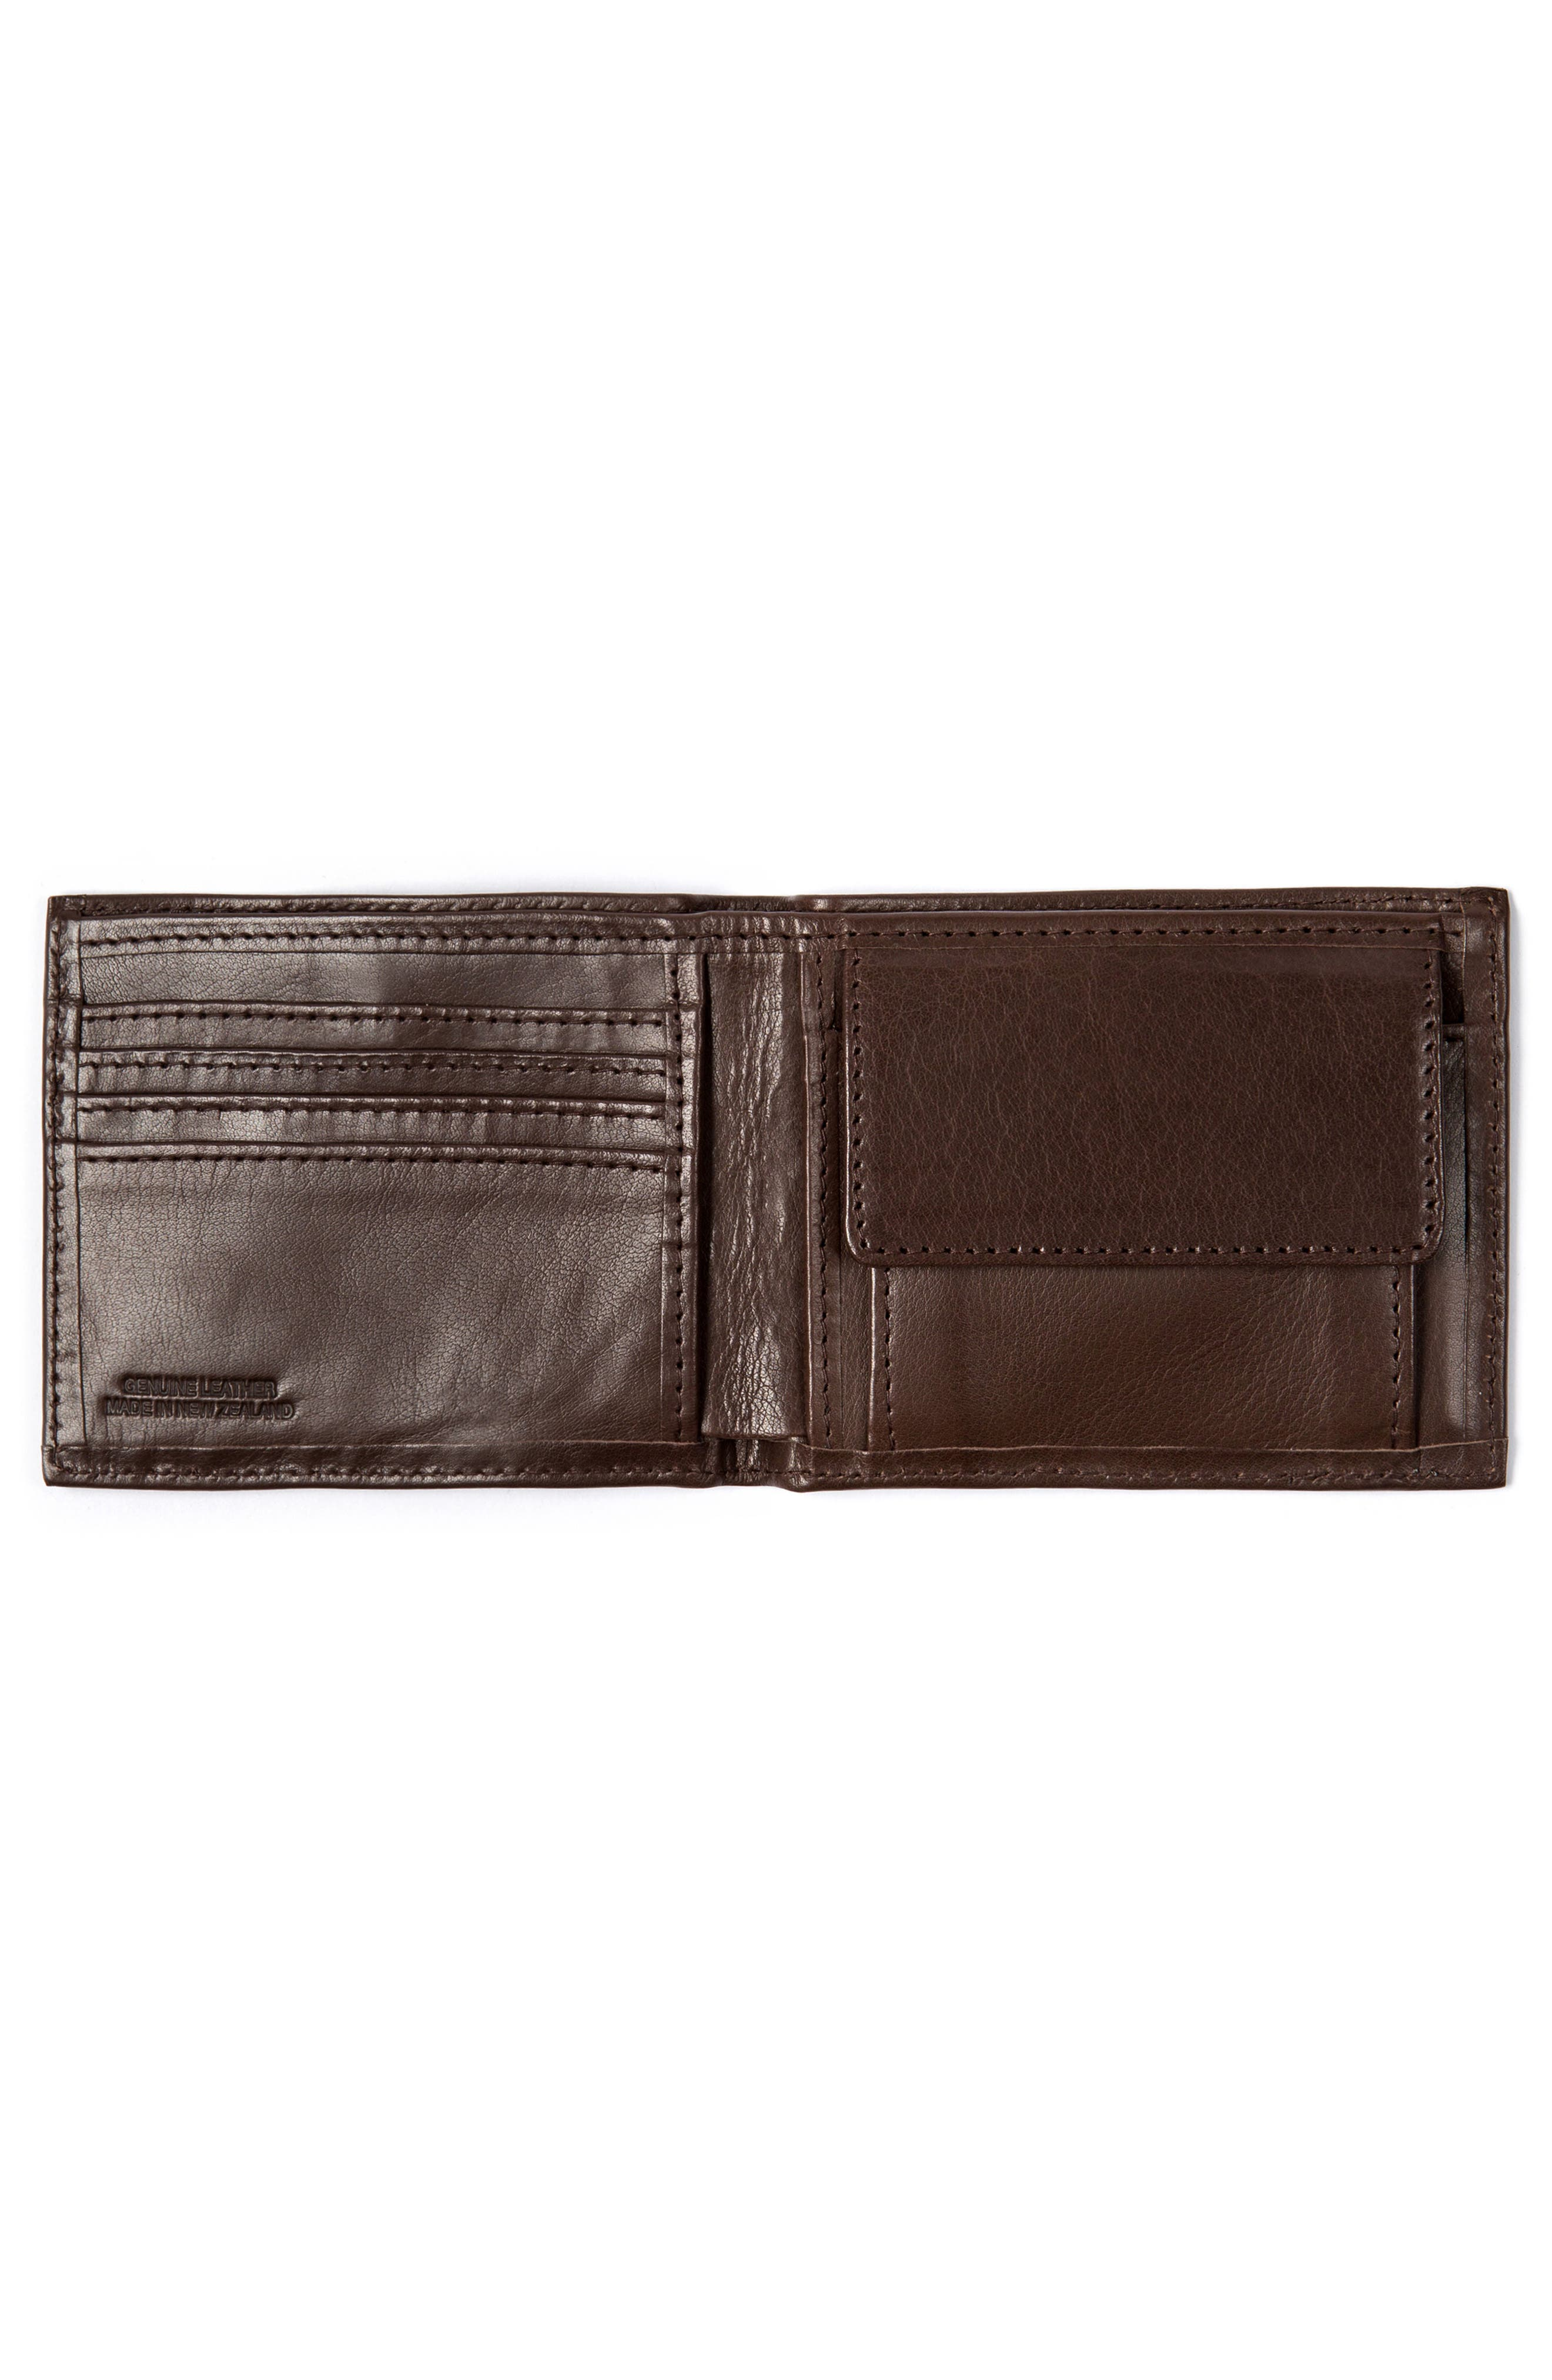 Leeston Wallet,                             Alternate thumbnail 2, color,                             CREEK